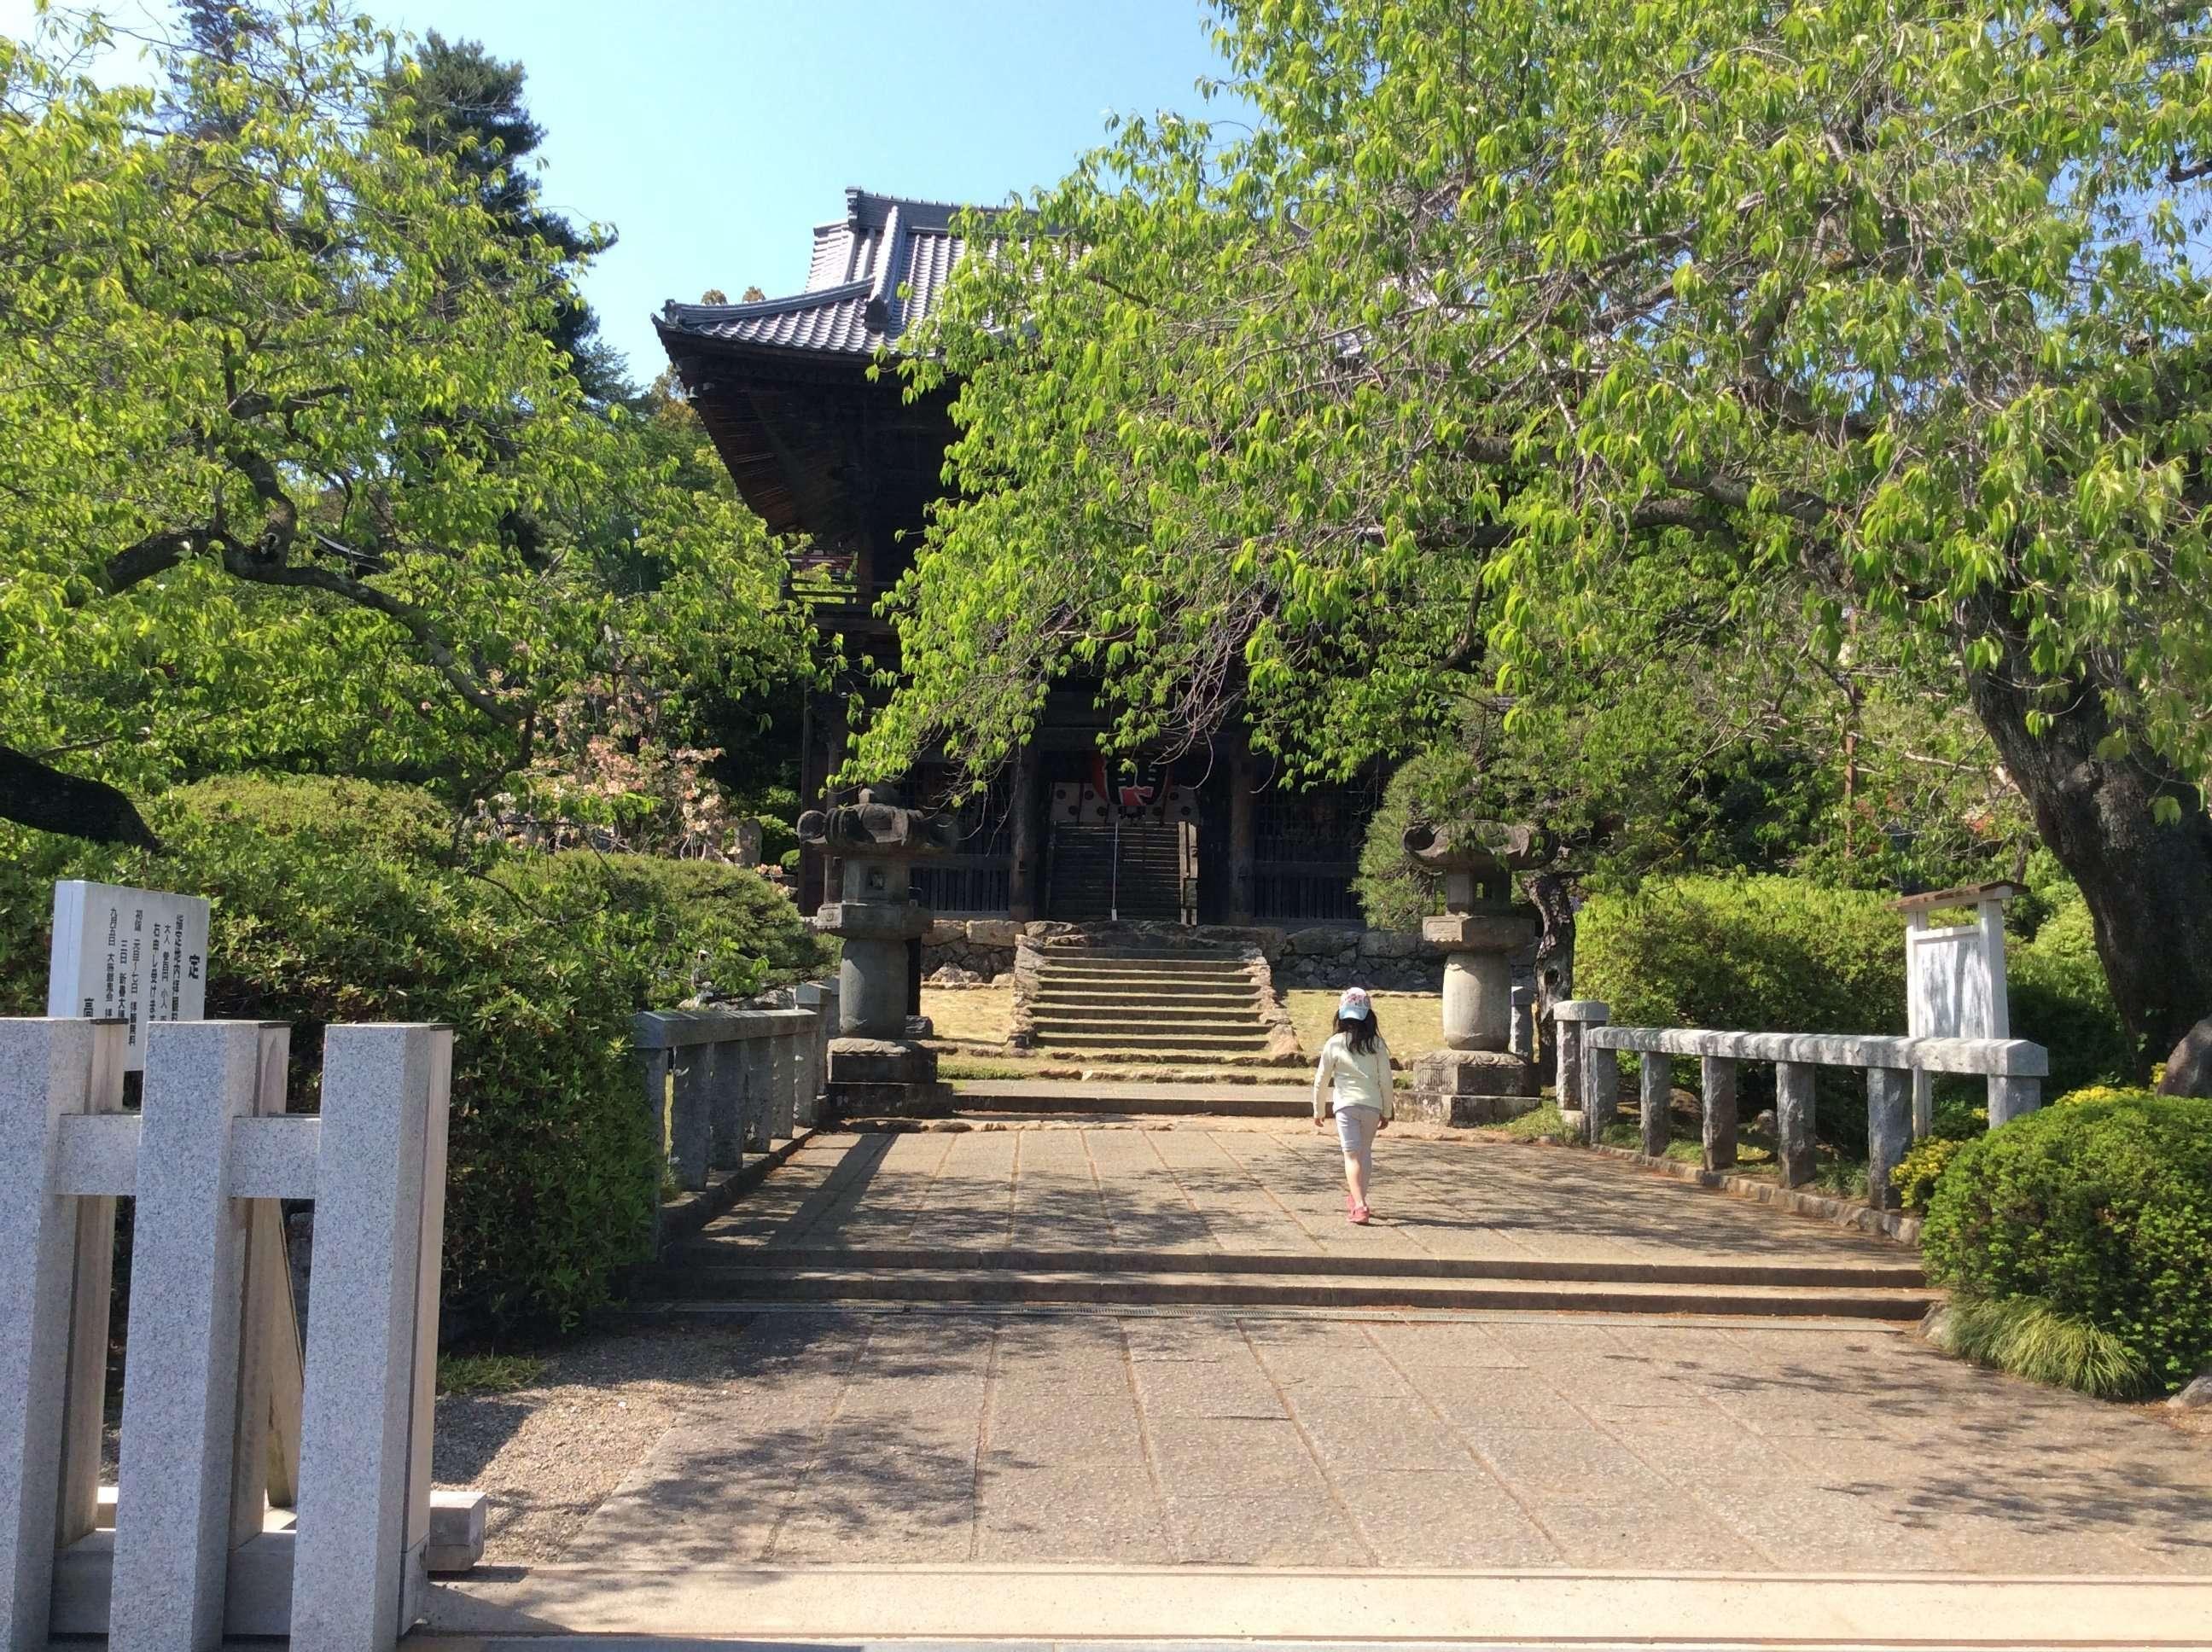 Bridge leads to the ancient gate of Shoden Temple, Hidaka, Saitama. shotenin